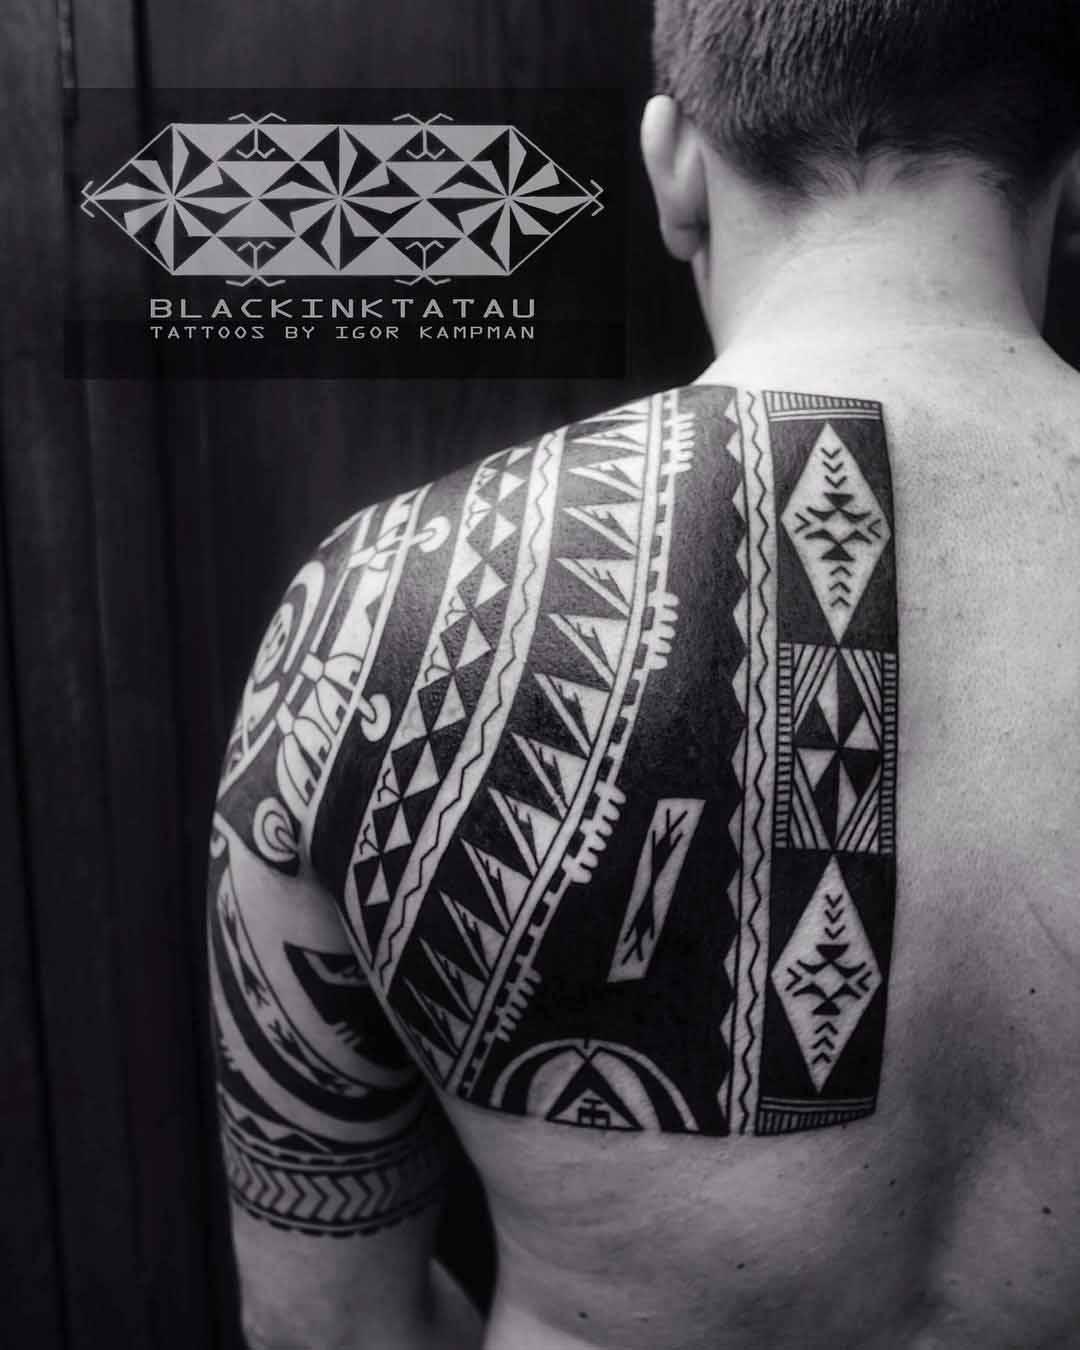 Shoulder Blade Maori Tattoo by Igor Kampman